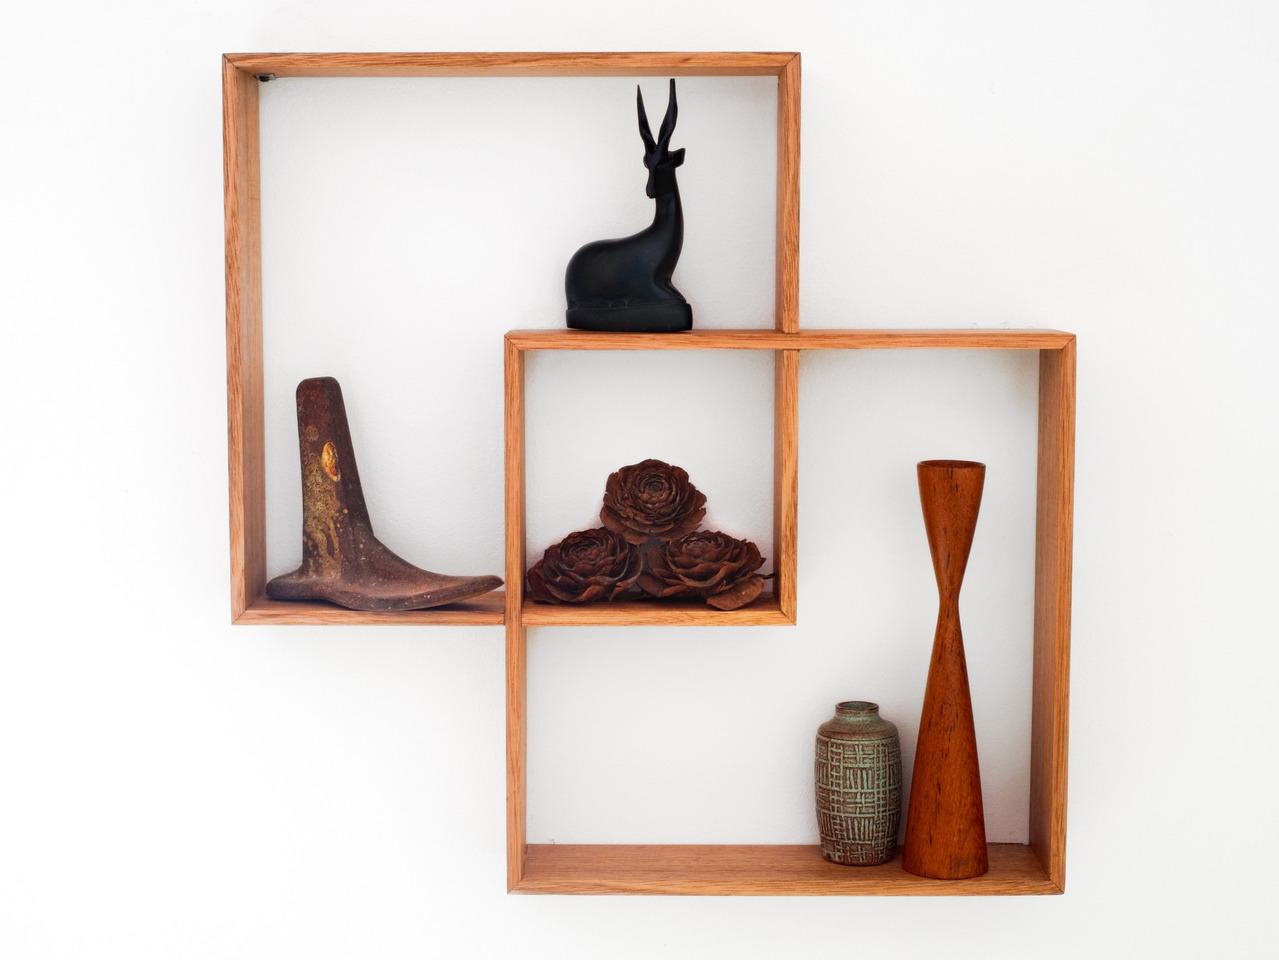 Furniture Box 2 Box Shadow Box Shelf By Senkki Furniture Handkrafted